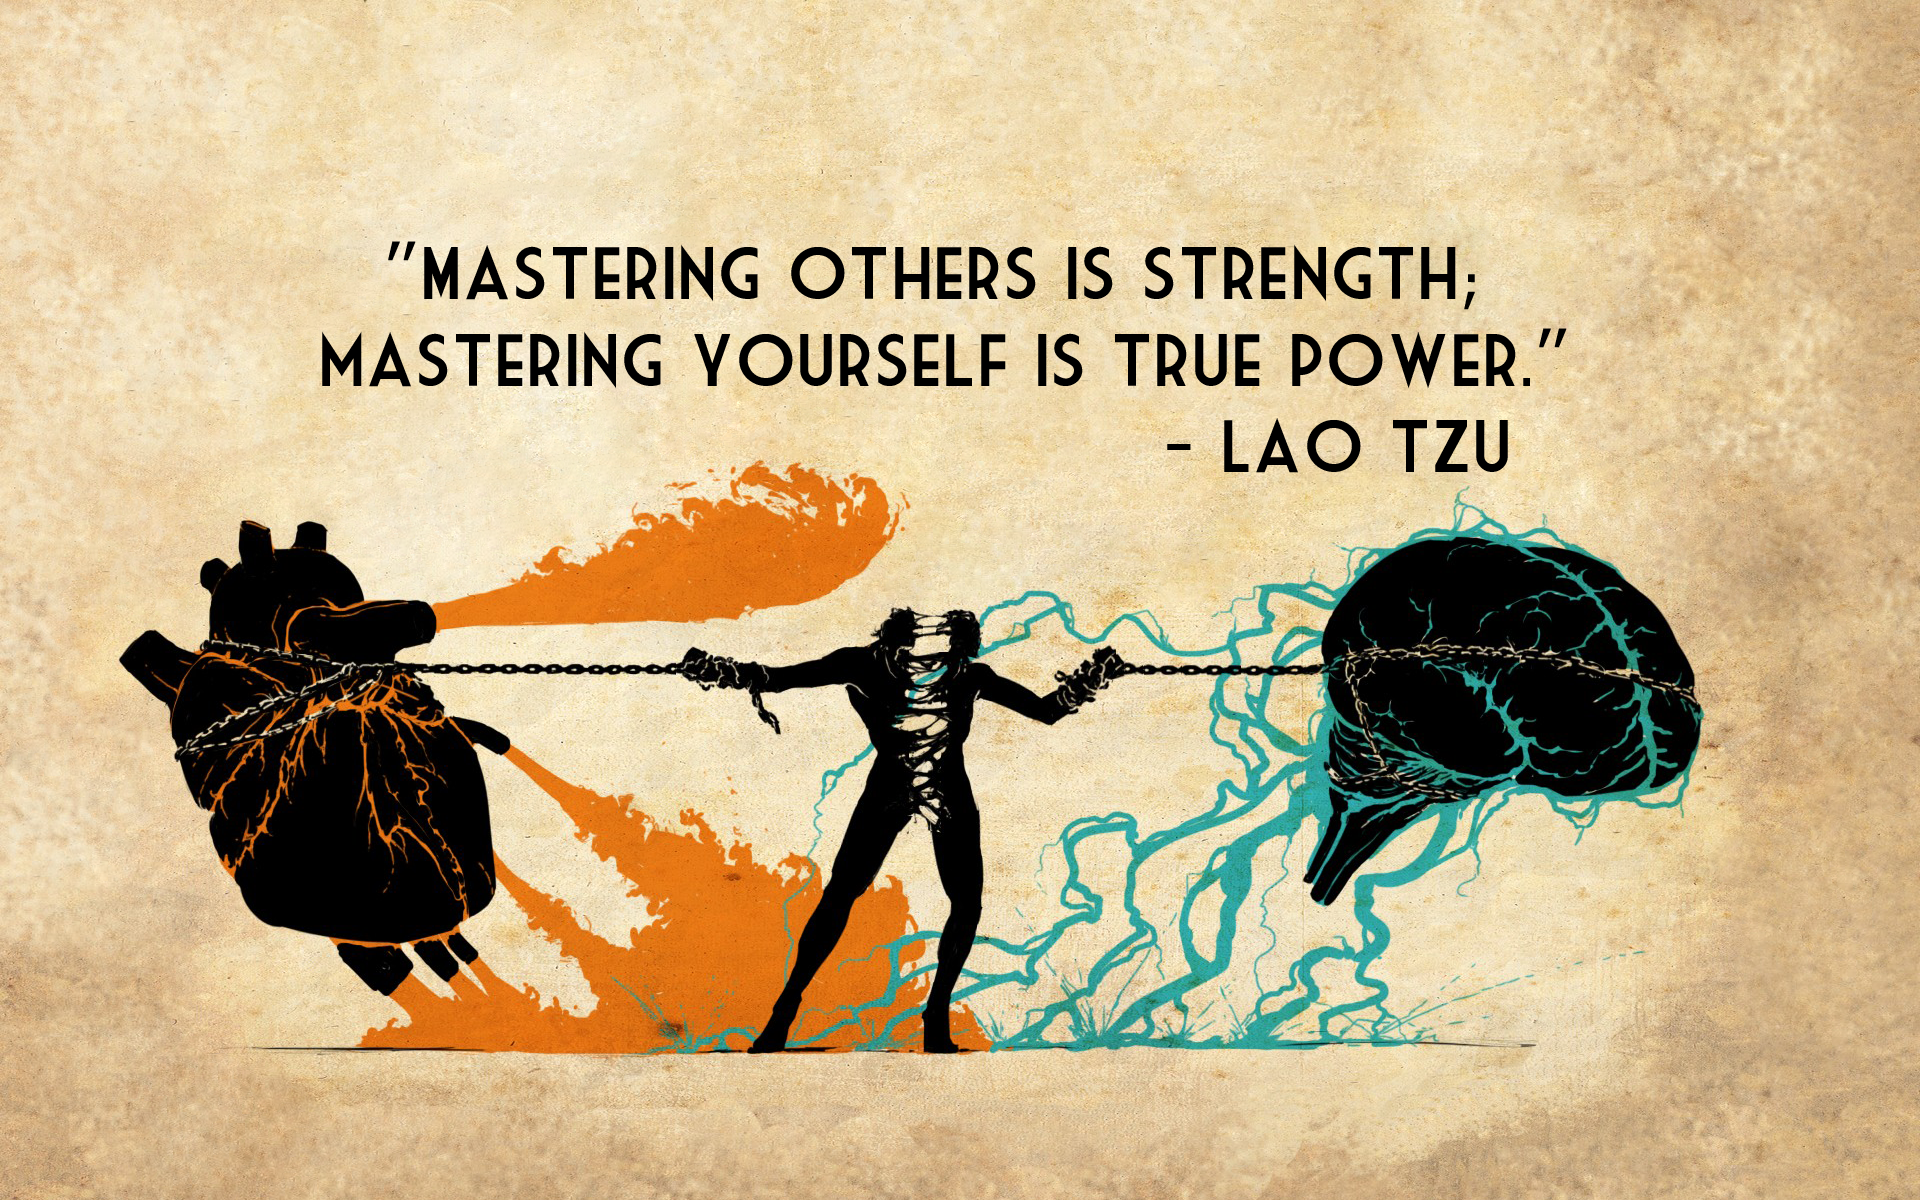 Mastering Strength True Power Lao Tzu quotes texts brain heart 1920x1200